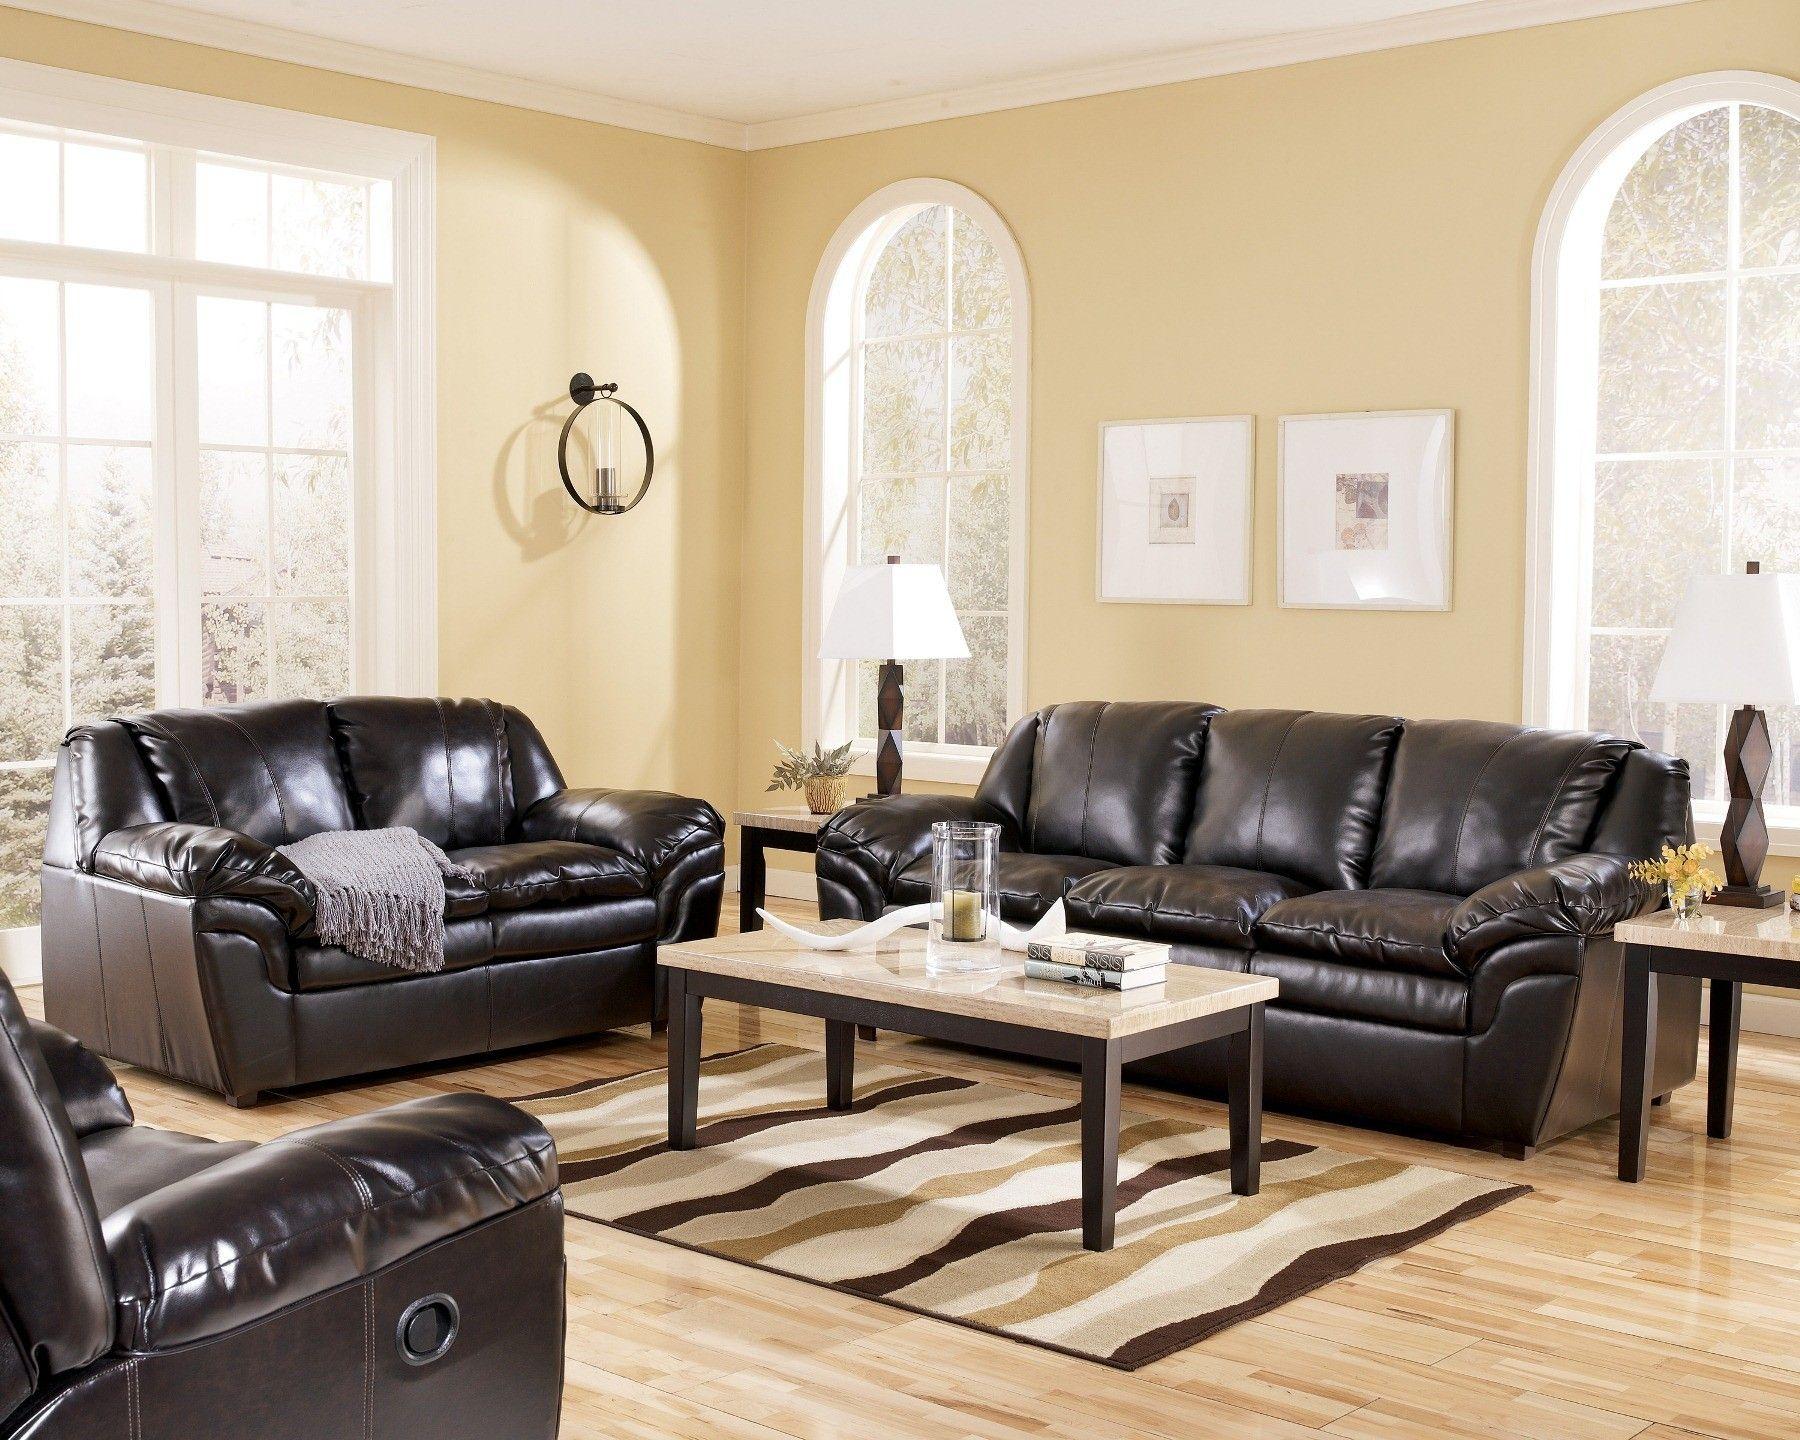 Living Room Sectional Design Living Room Inspiration 1800x1440 Design Living Room Leather Sofa Living Black Leather Sofa Living Room Leather Sofa Living Room